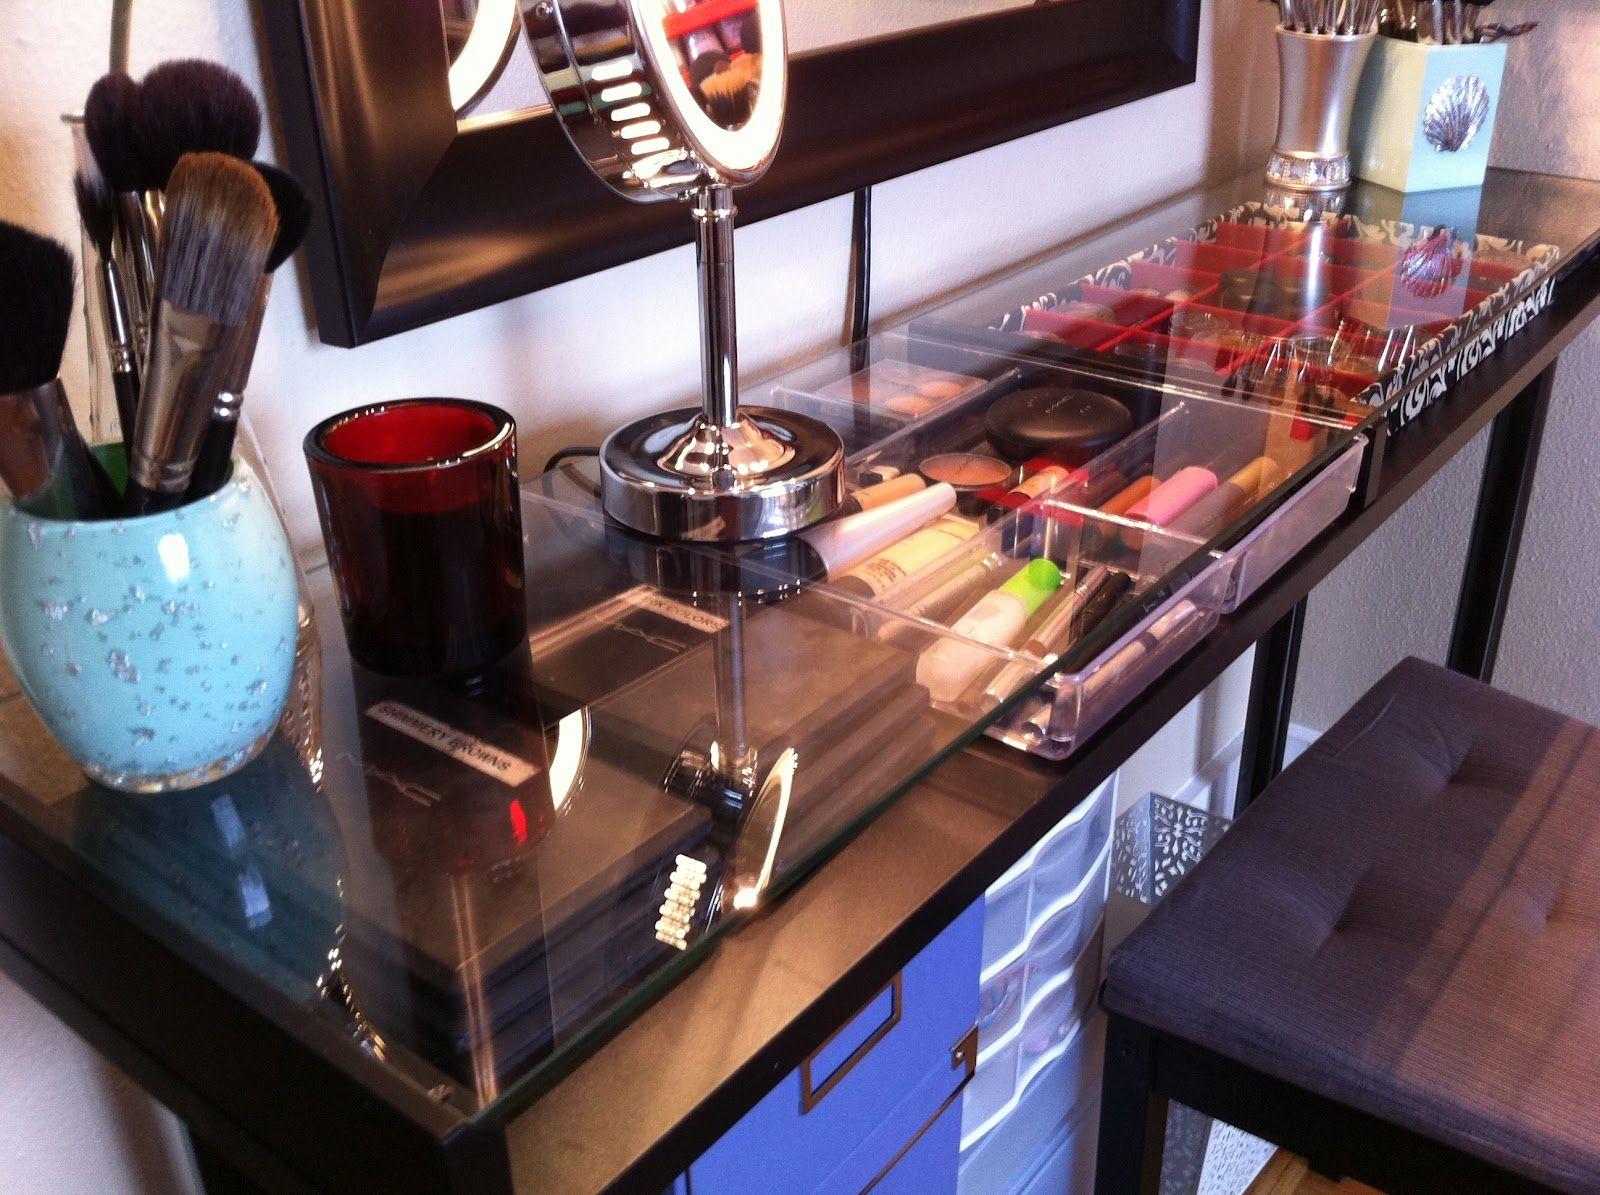 29 Ekby Gruven Shelf from ikea turned vanity table Diy